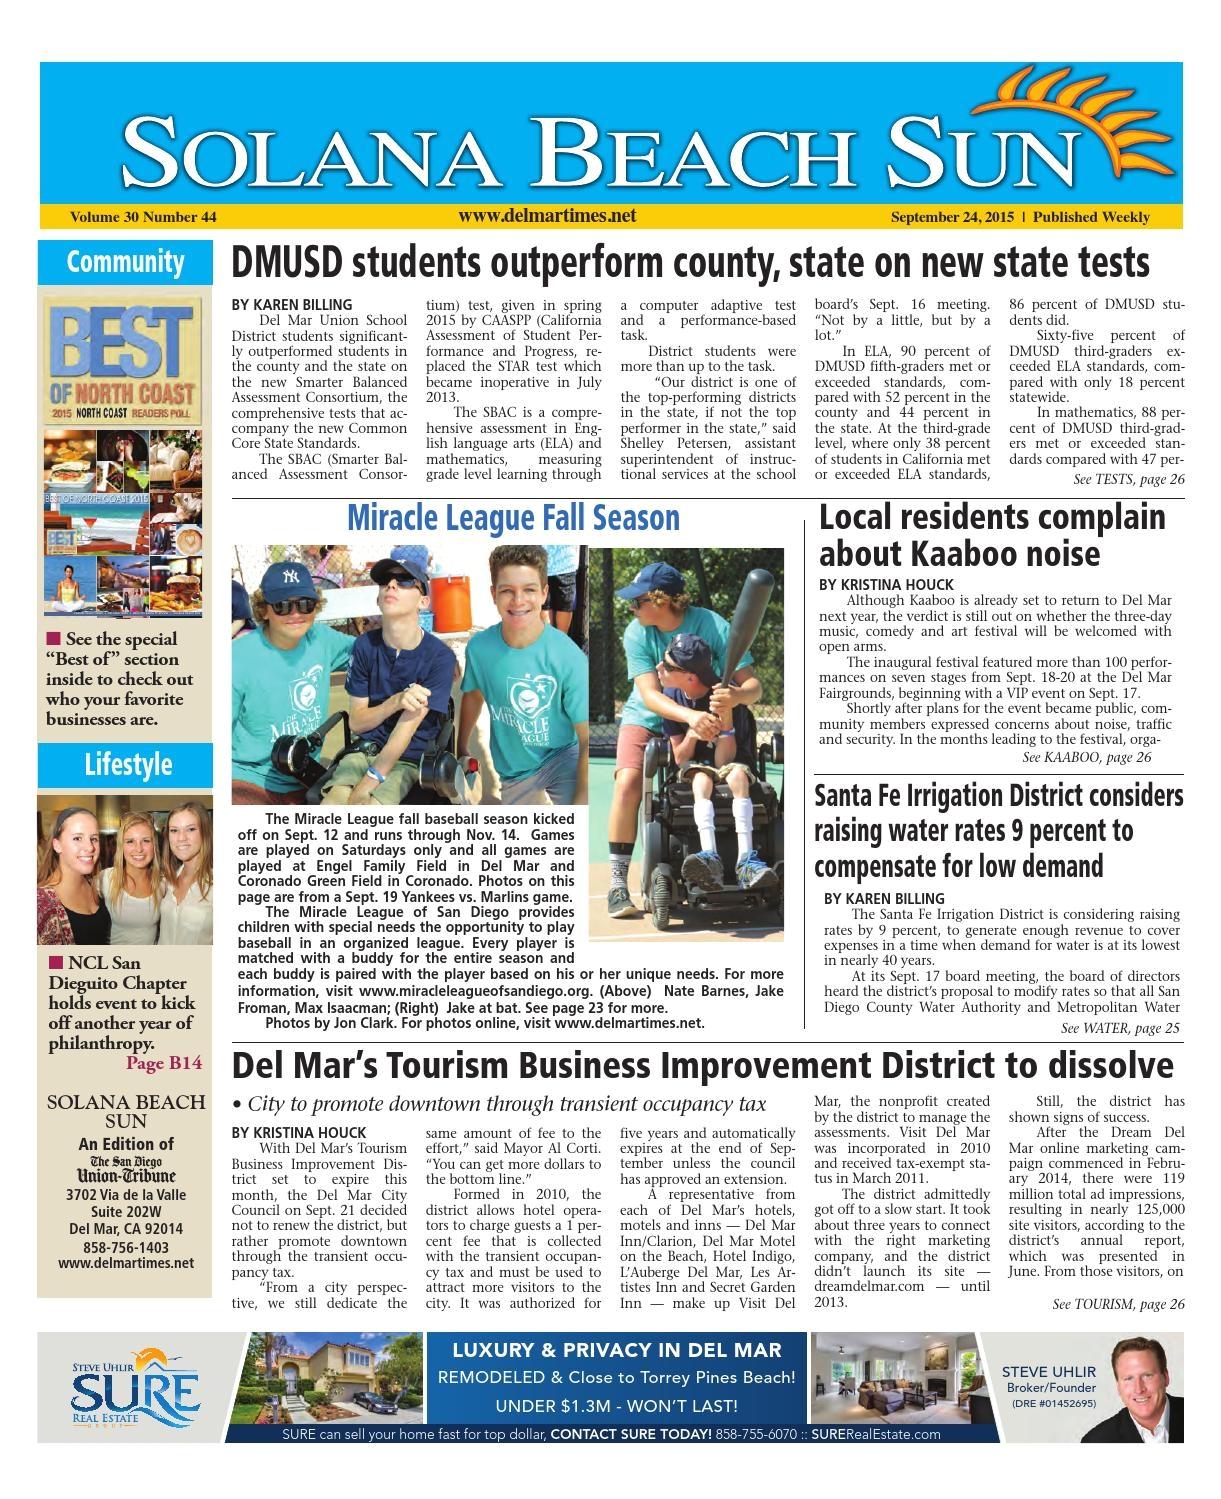 Trio Paint Floor Covering Burton Mi solana Beach Sun 9 24 15 by Mainstreet Media issuu